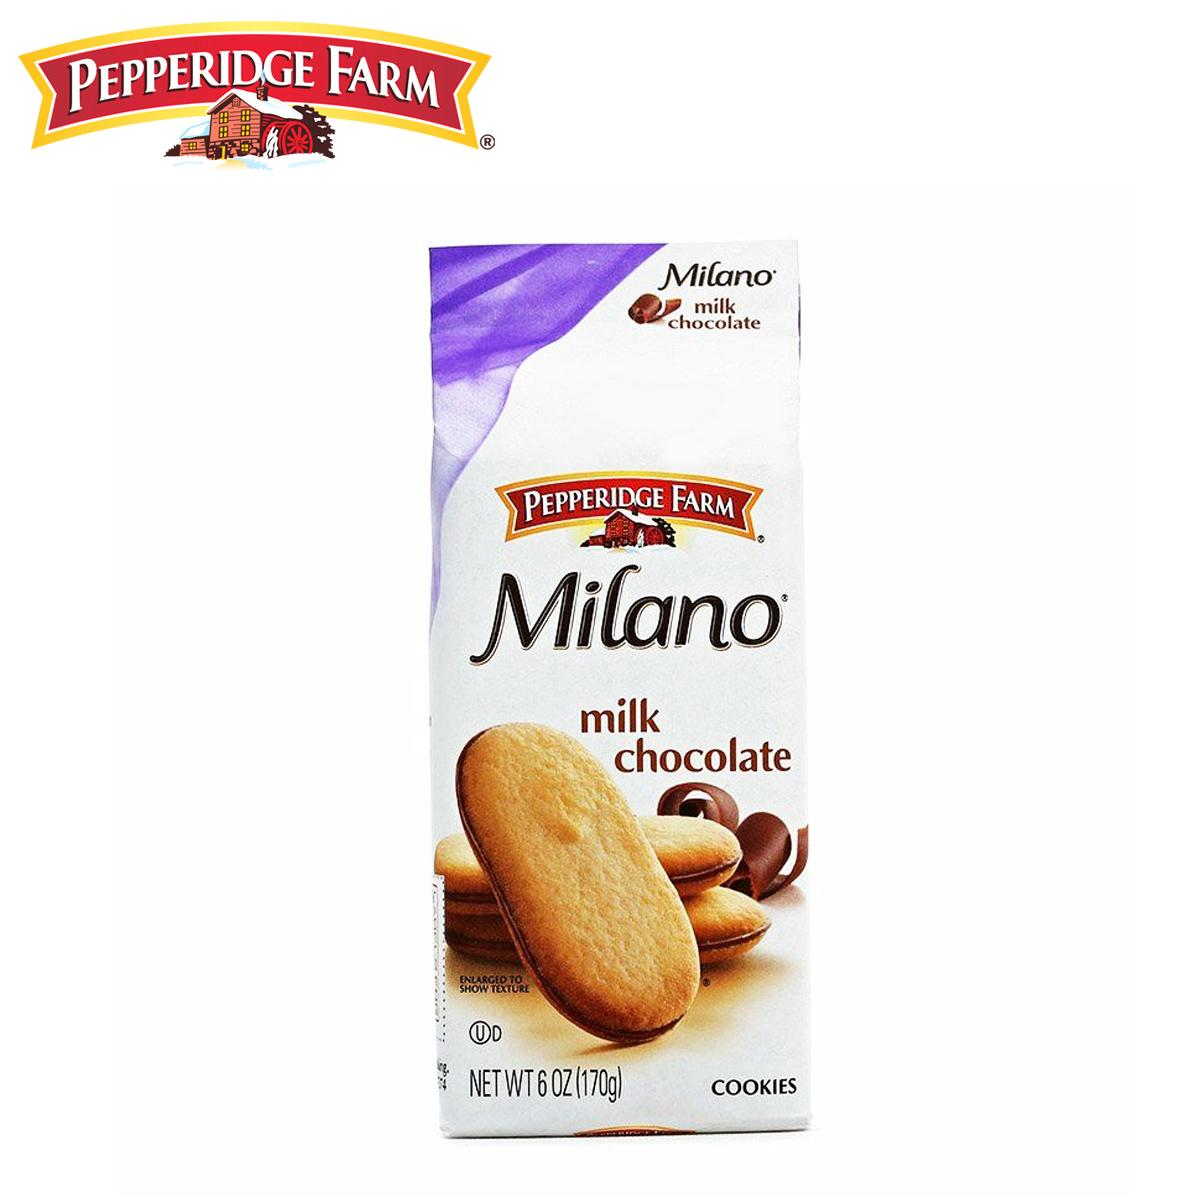 BÁNH QUY SOCOLA MILK CHOCOLATE MILANO PEPPERIDGE FARM